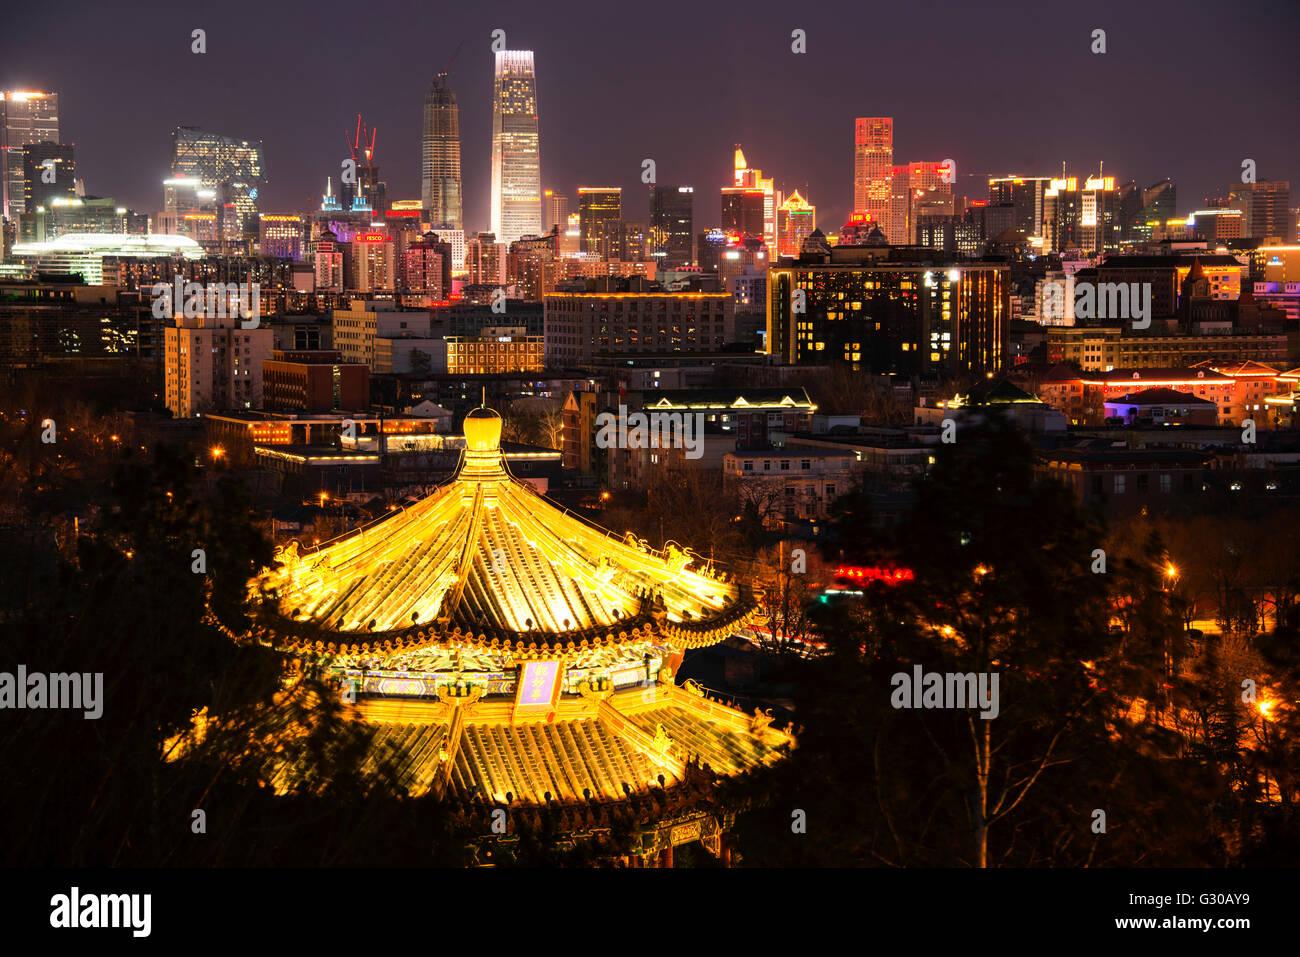 Beleuchteten Pagode und Beijing Stadtbild bei Nacht, Peking, China, Asien Stockbild